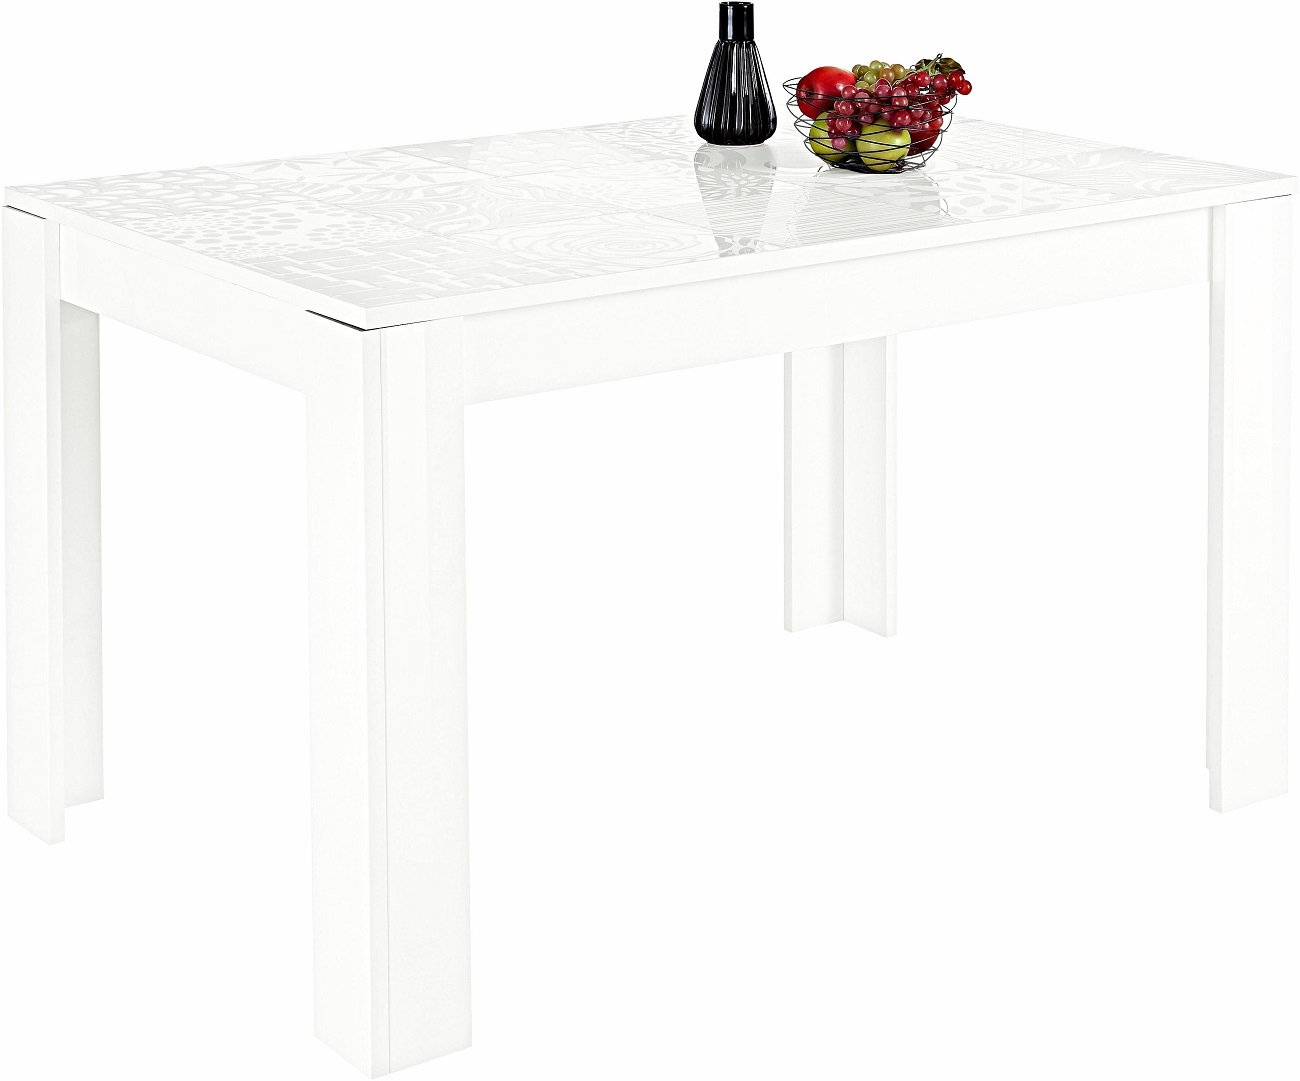 Eettafel Miro 180 cm breed in hoogglans wit | Pesaro Mobilia